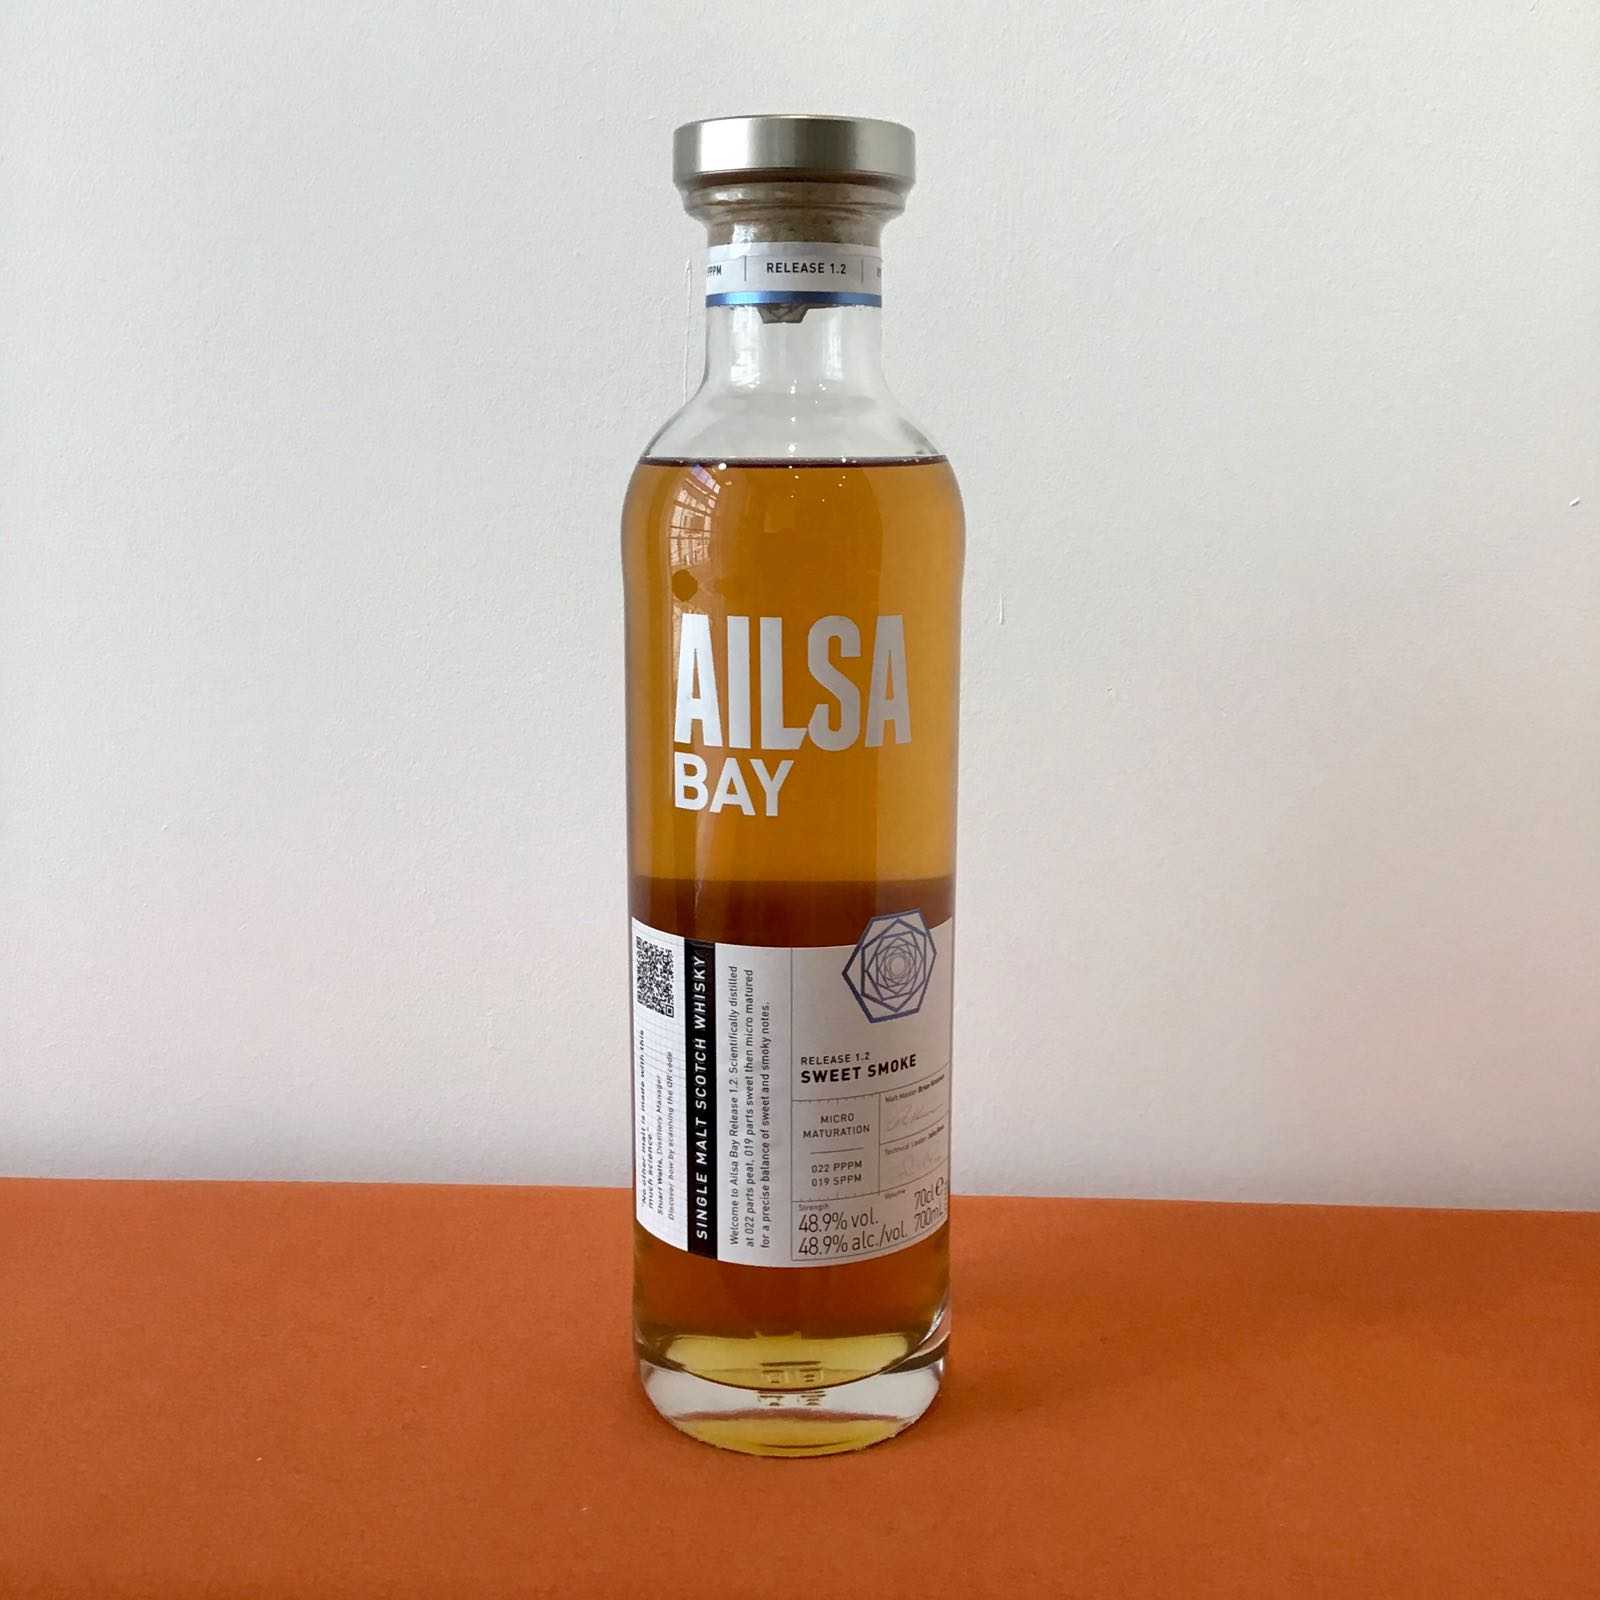 Ailsa Bay Release 1.2